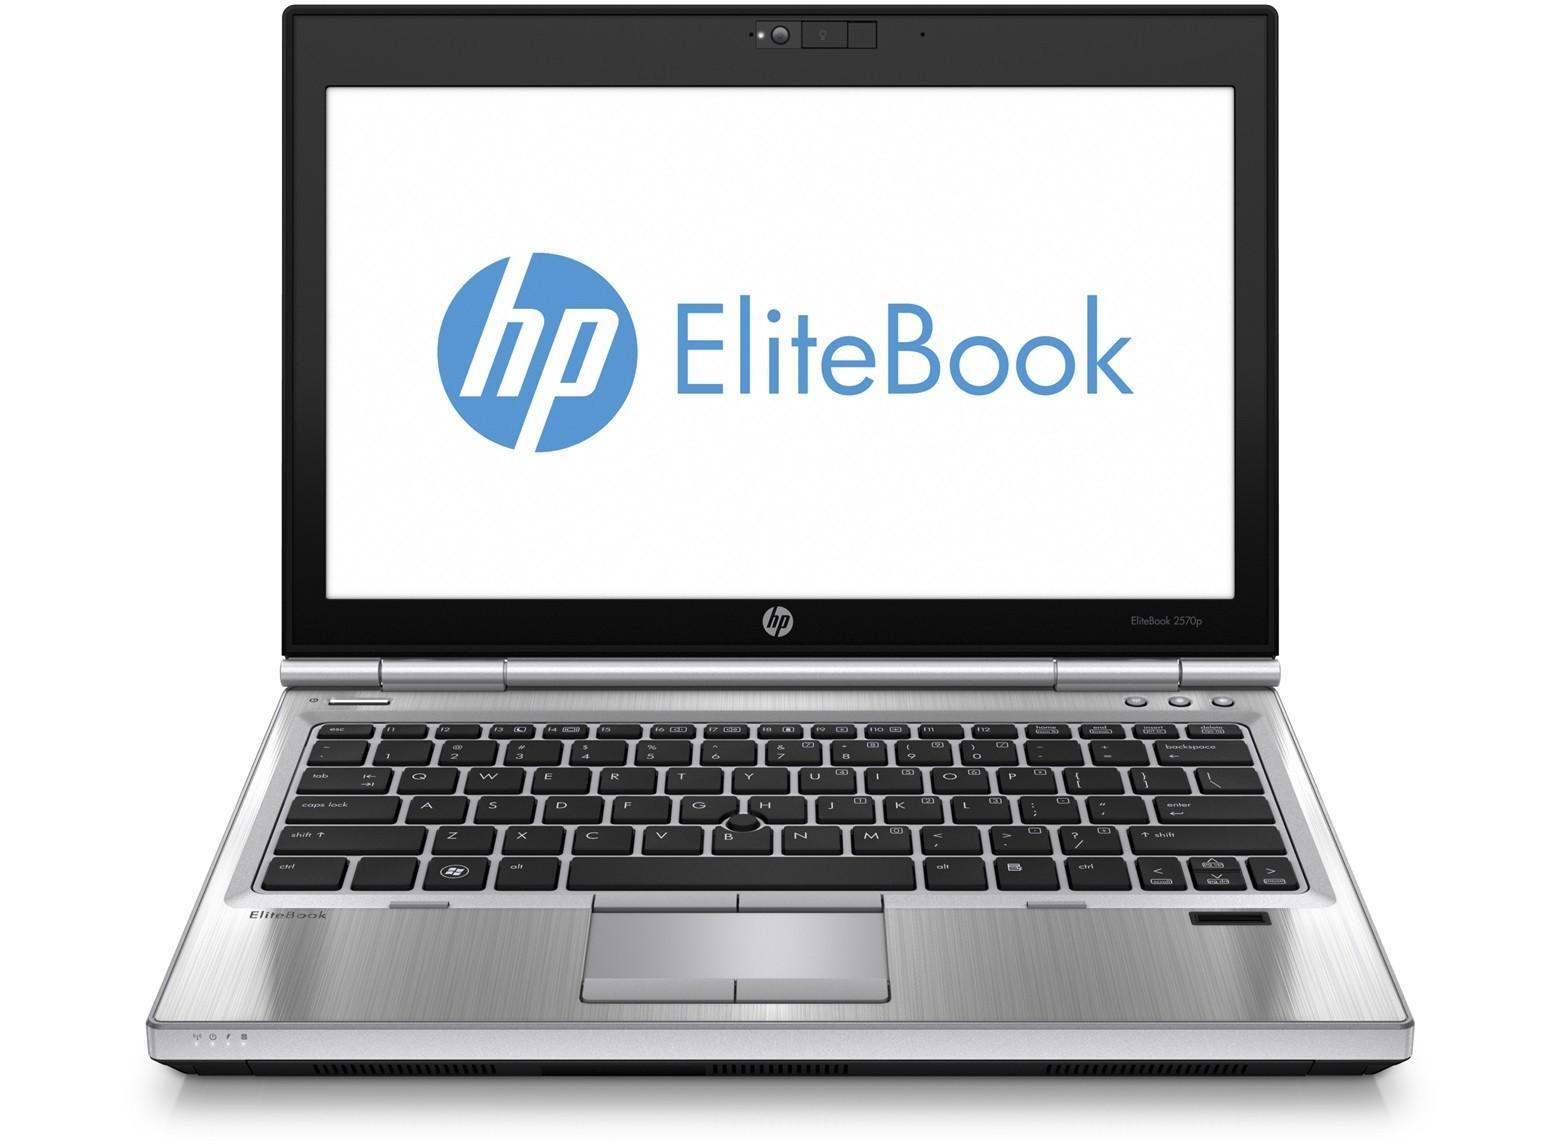 HP EliteBook 2570p Notebook PC (Open Box)